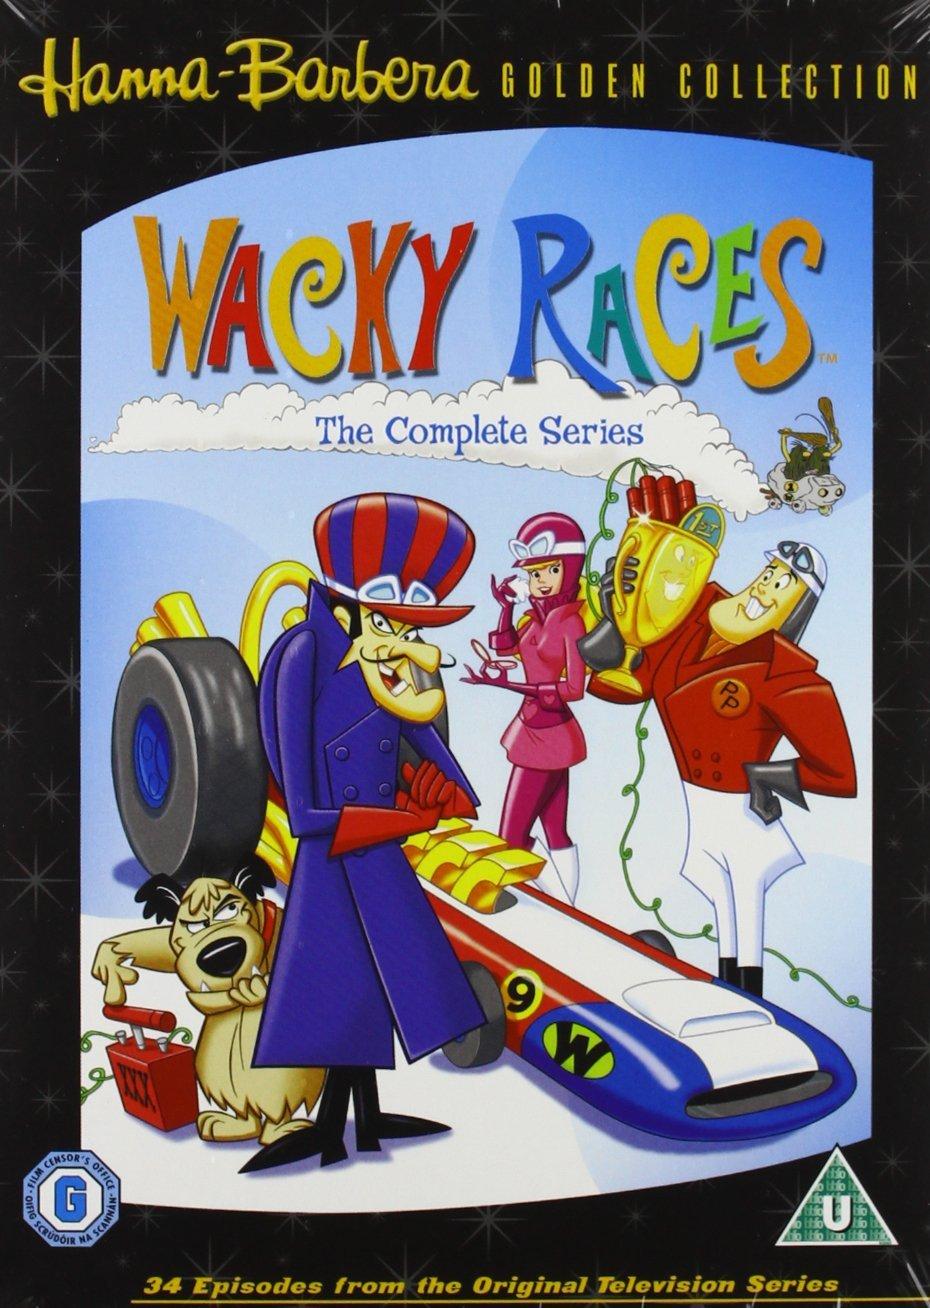 Wacky Races Wallpapers - Wallpaper Cave  |Wacky Racers Cartoon